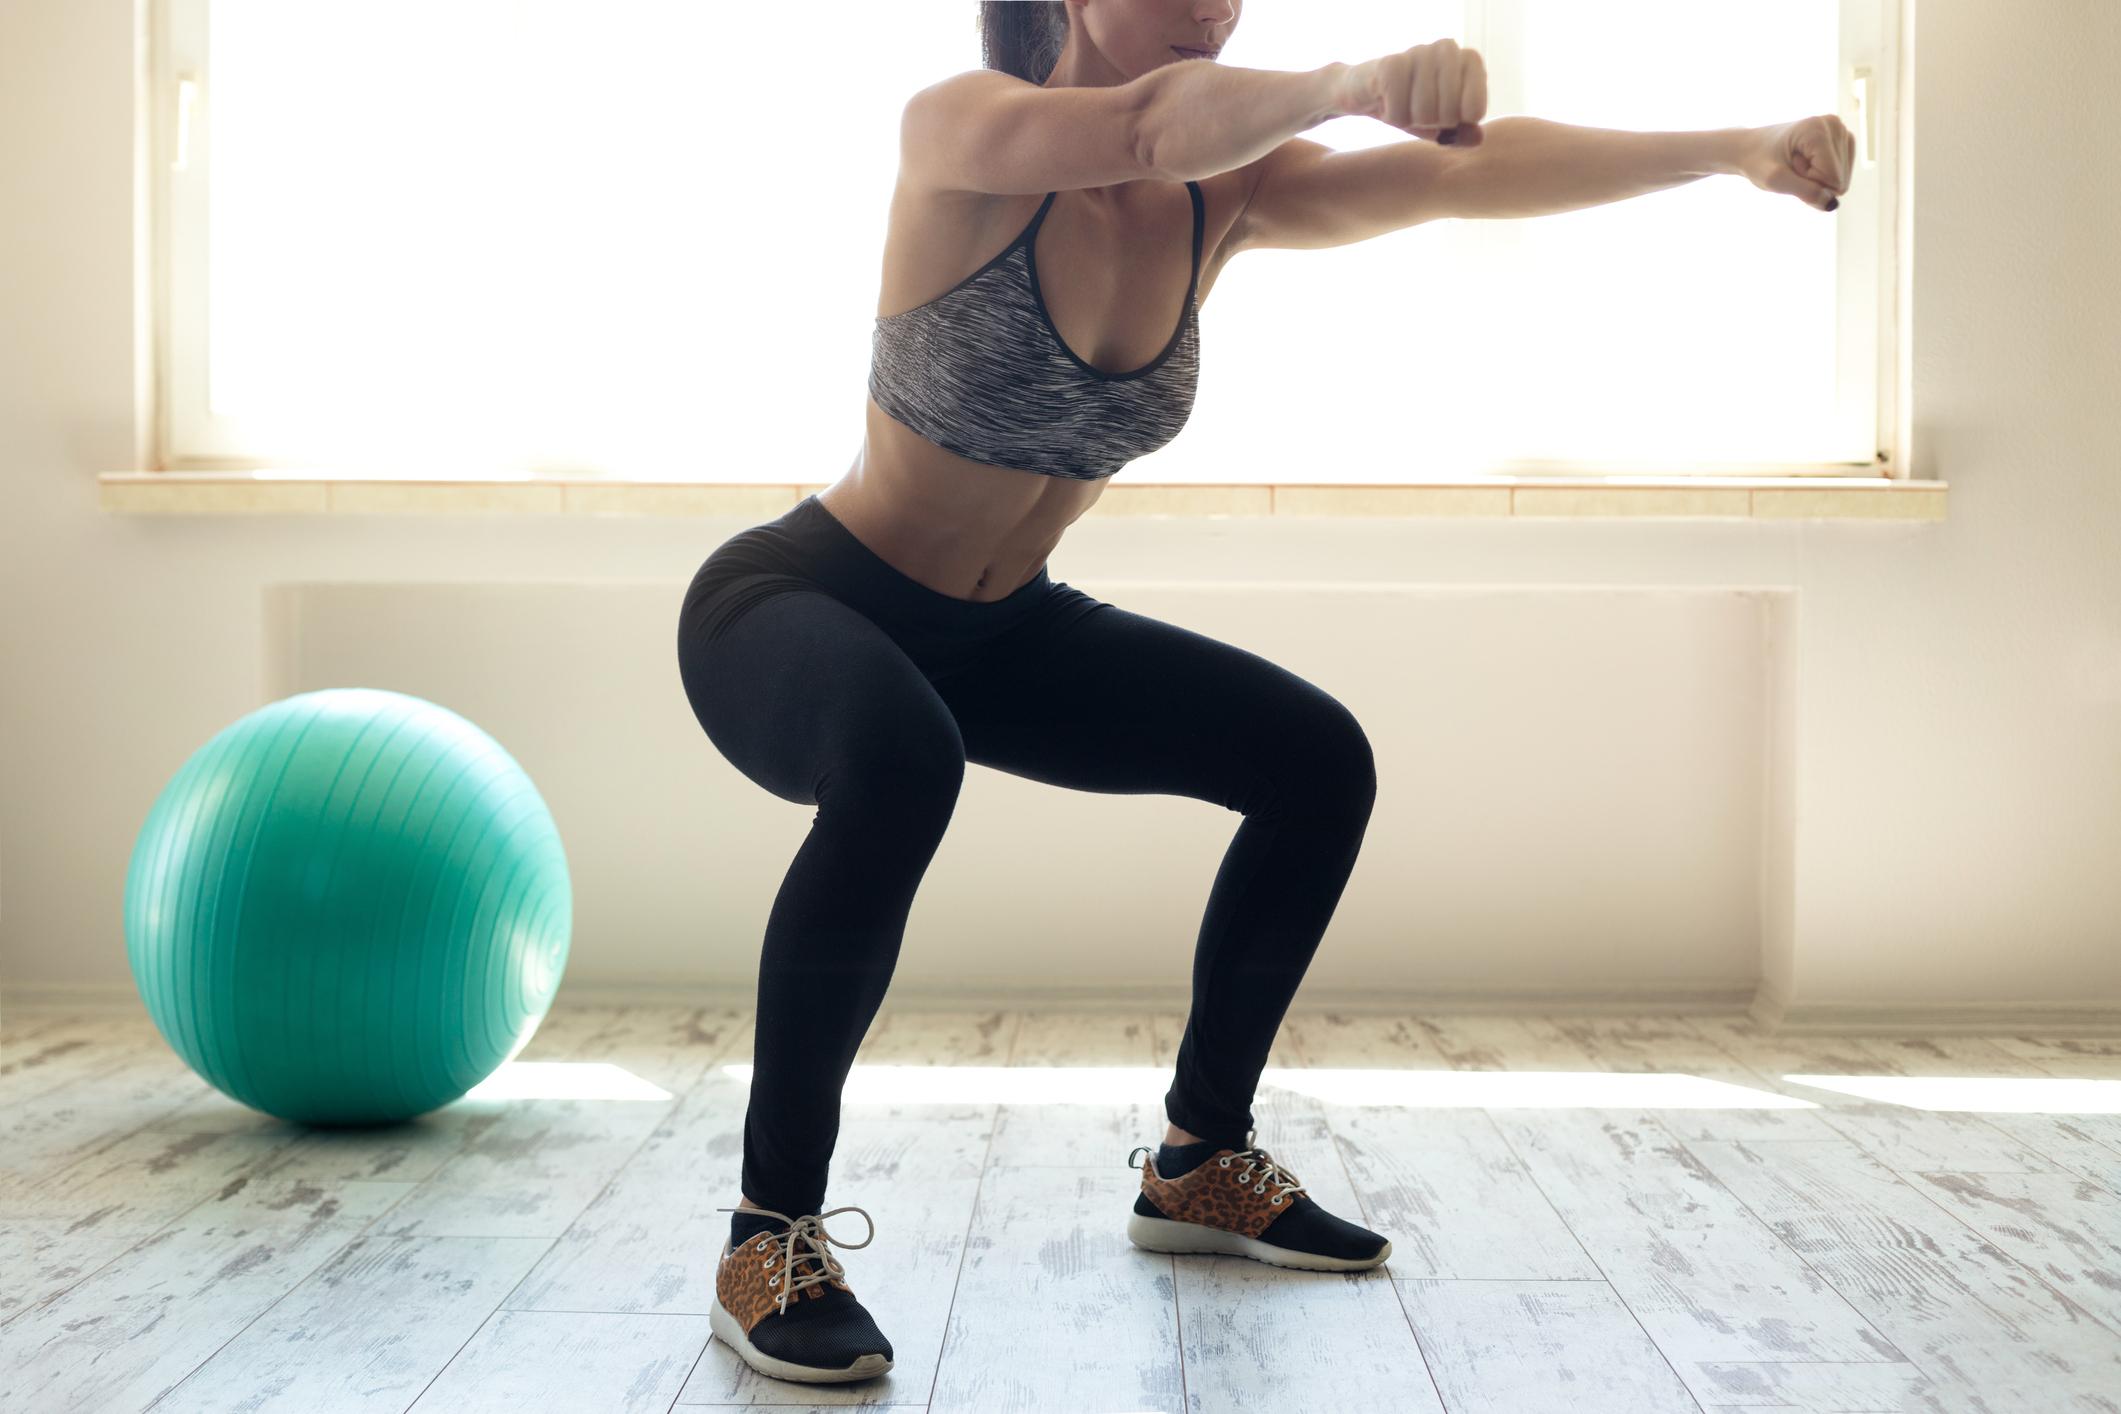 Butt squats